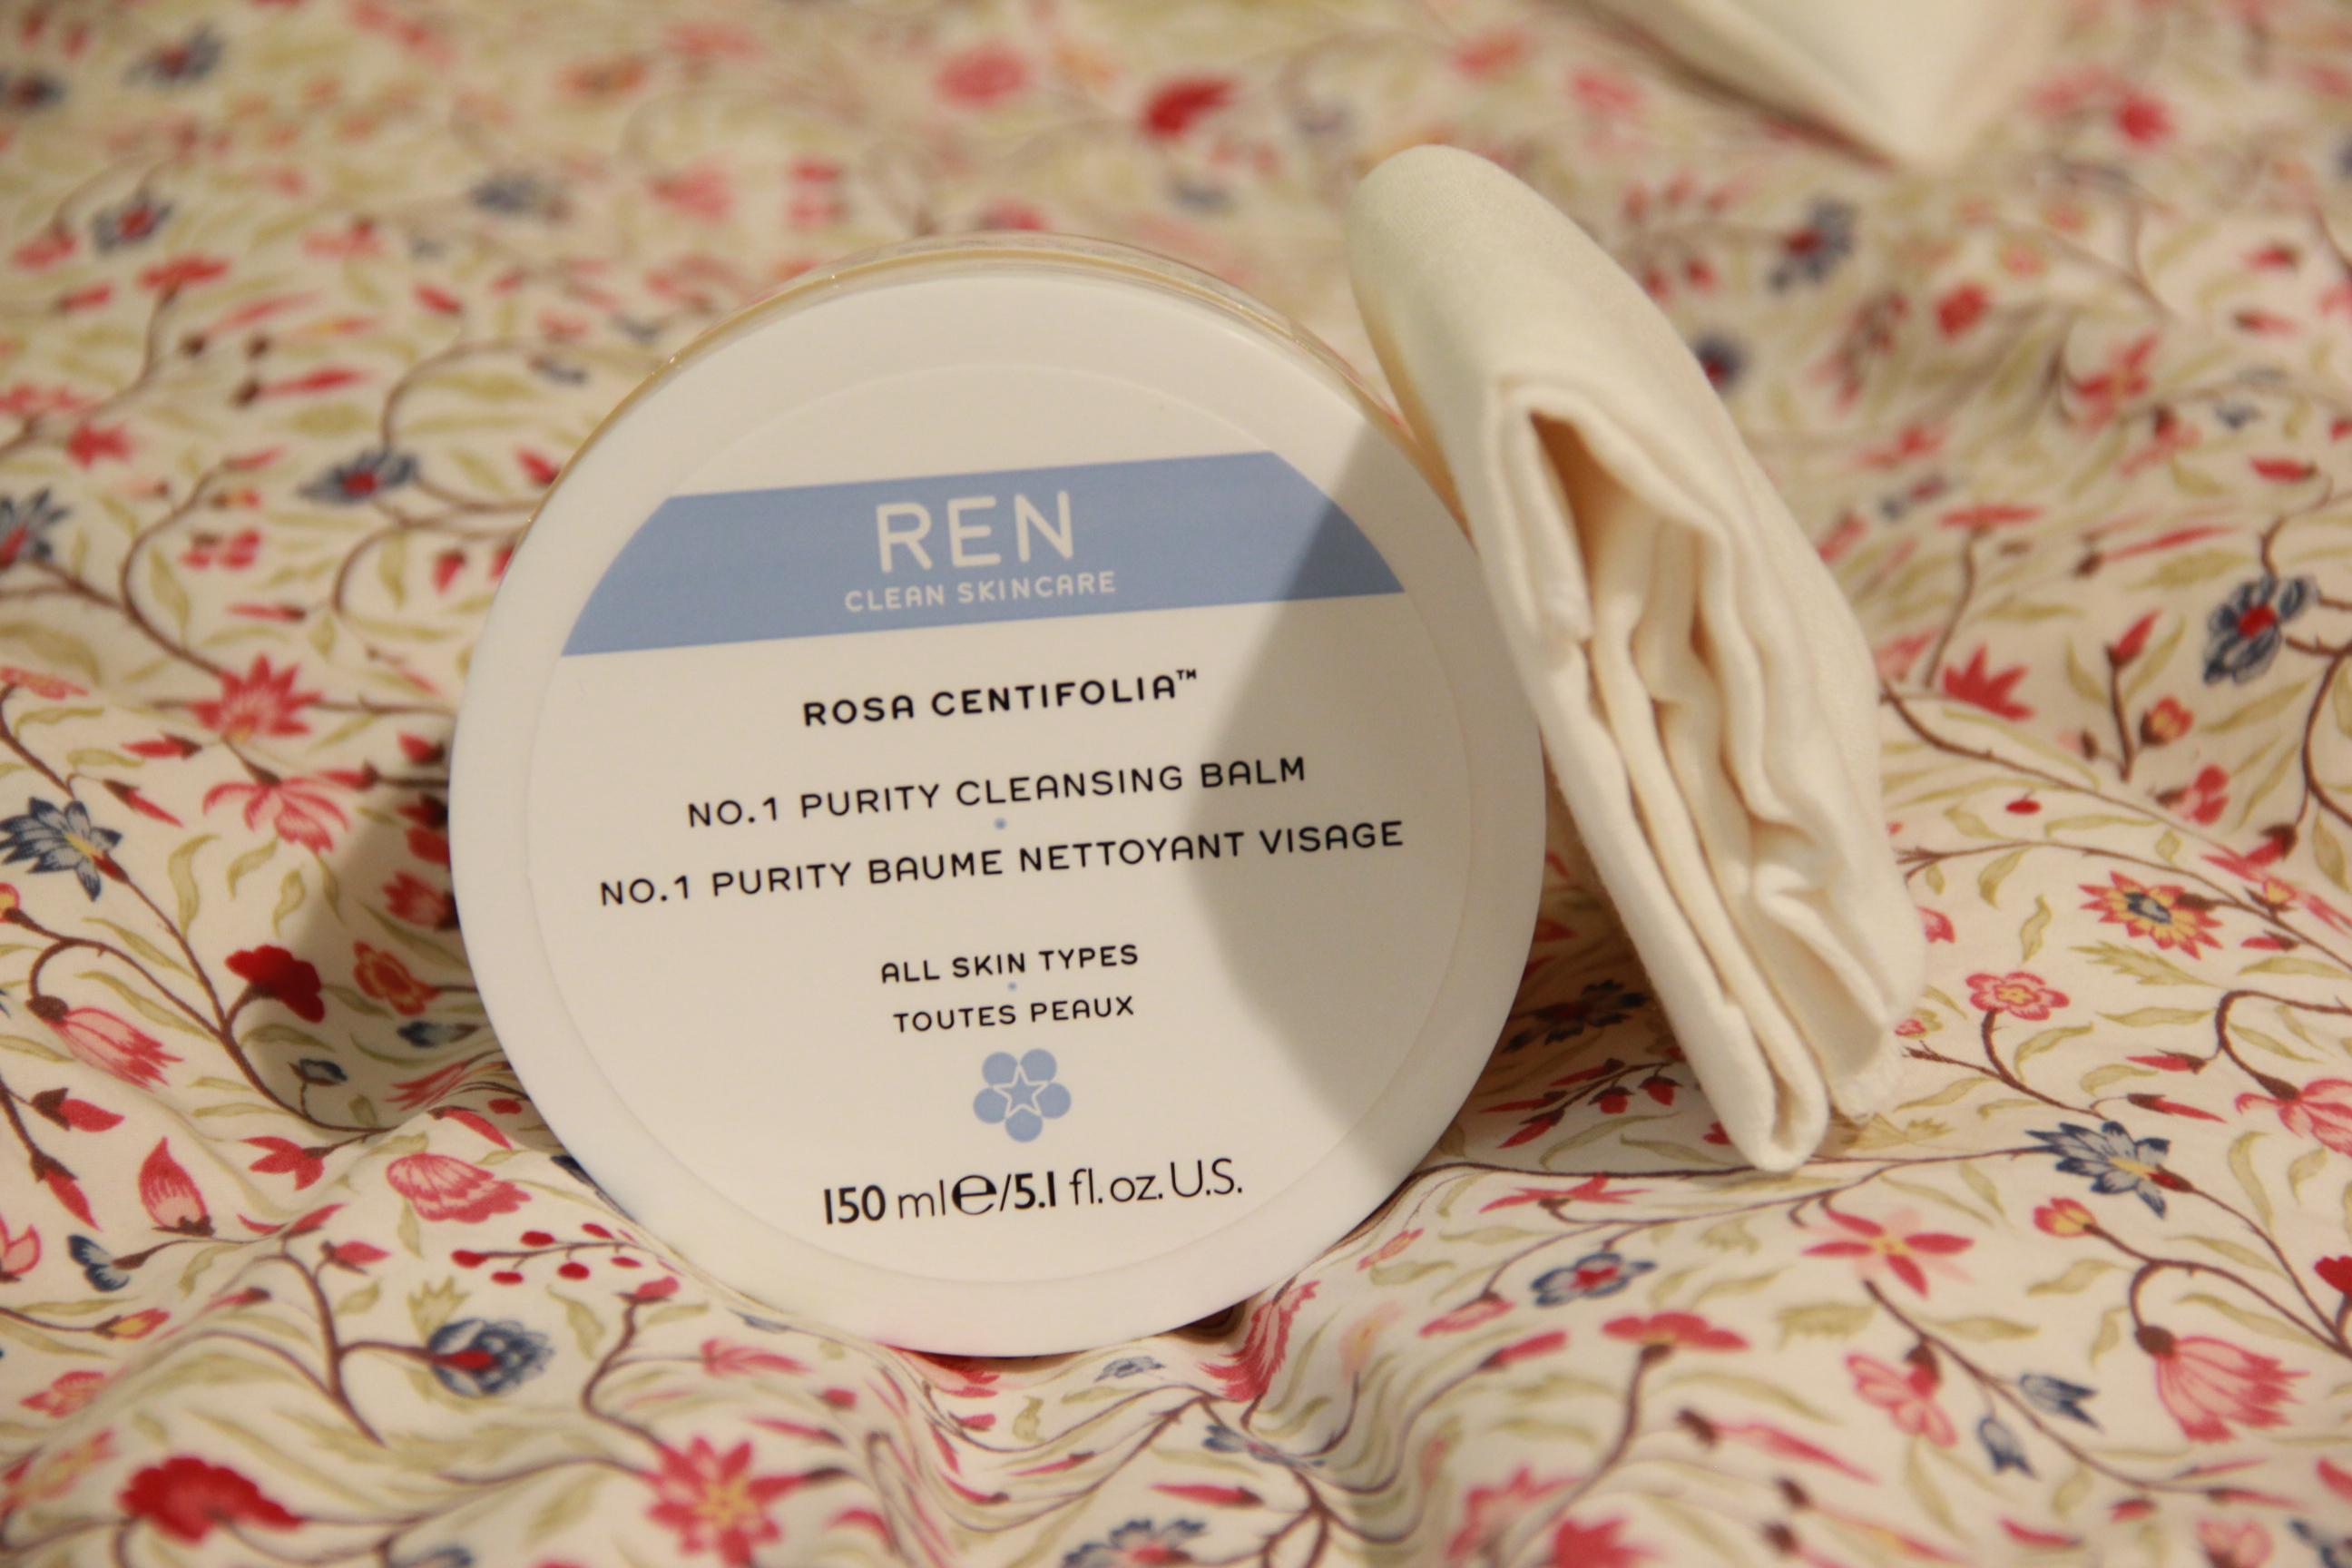 Ren Purity Cleansing Balm